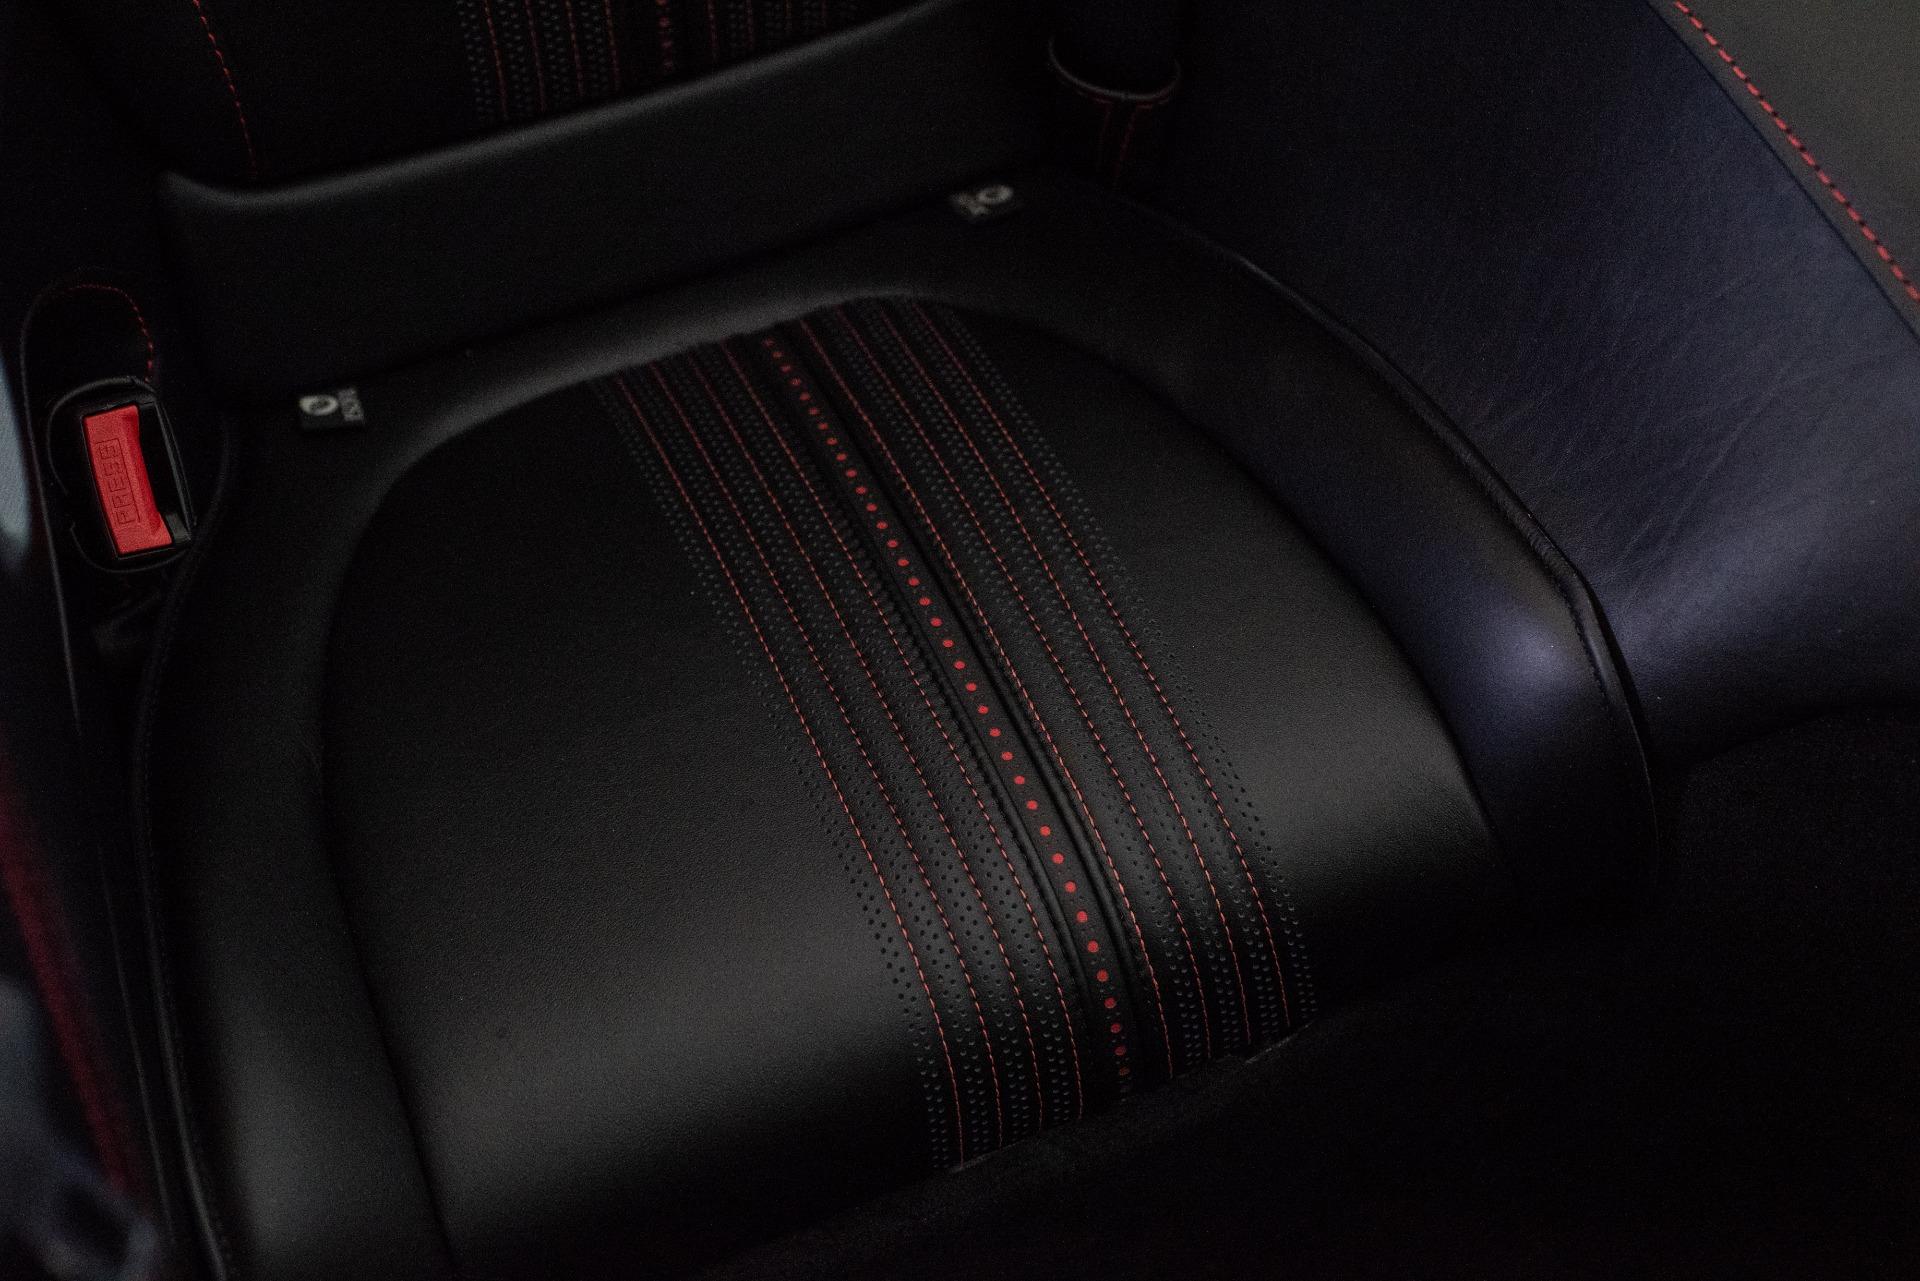 2019 Aston Martin Db11 Volante Stock 9nm06191 For Sale Near Vienna